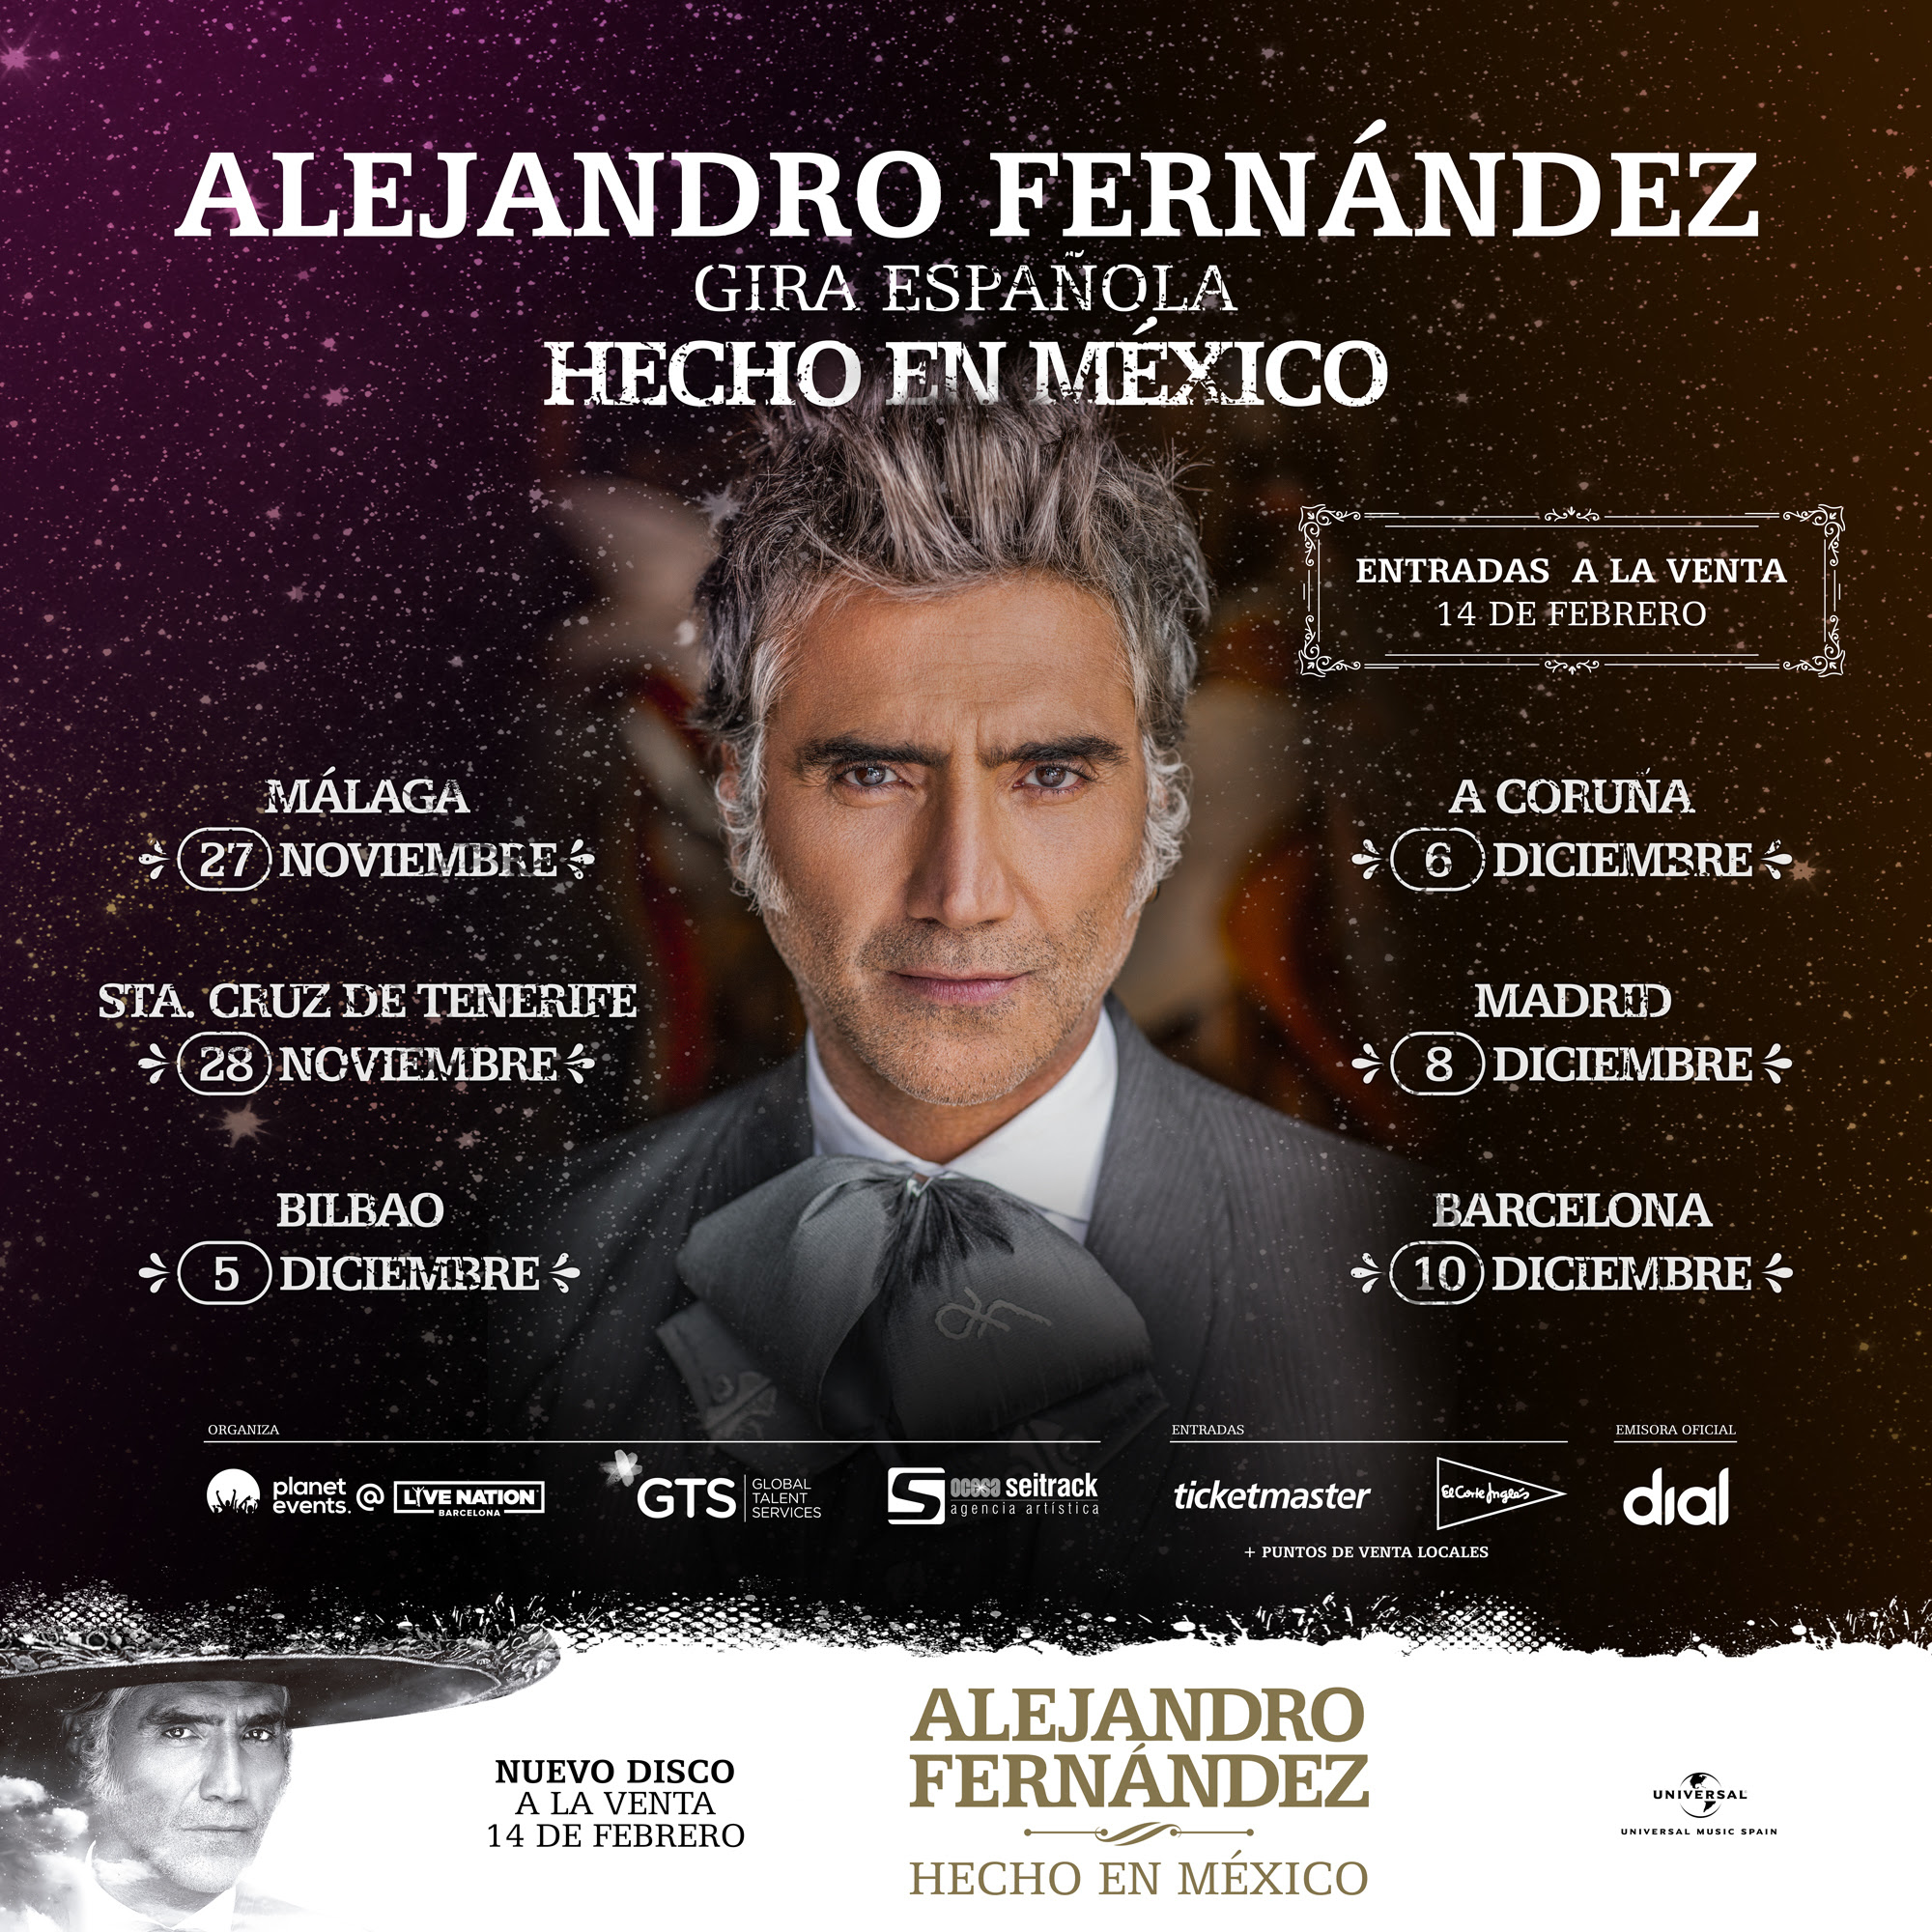 alejandro fernandez gira española